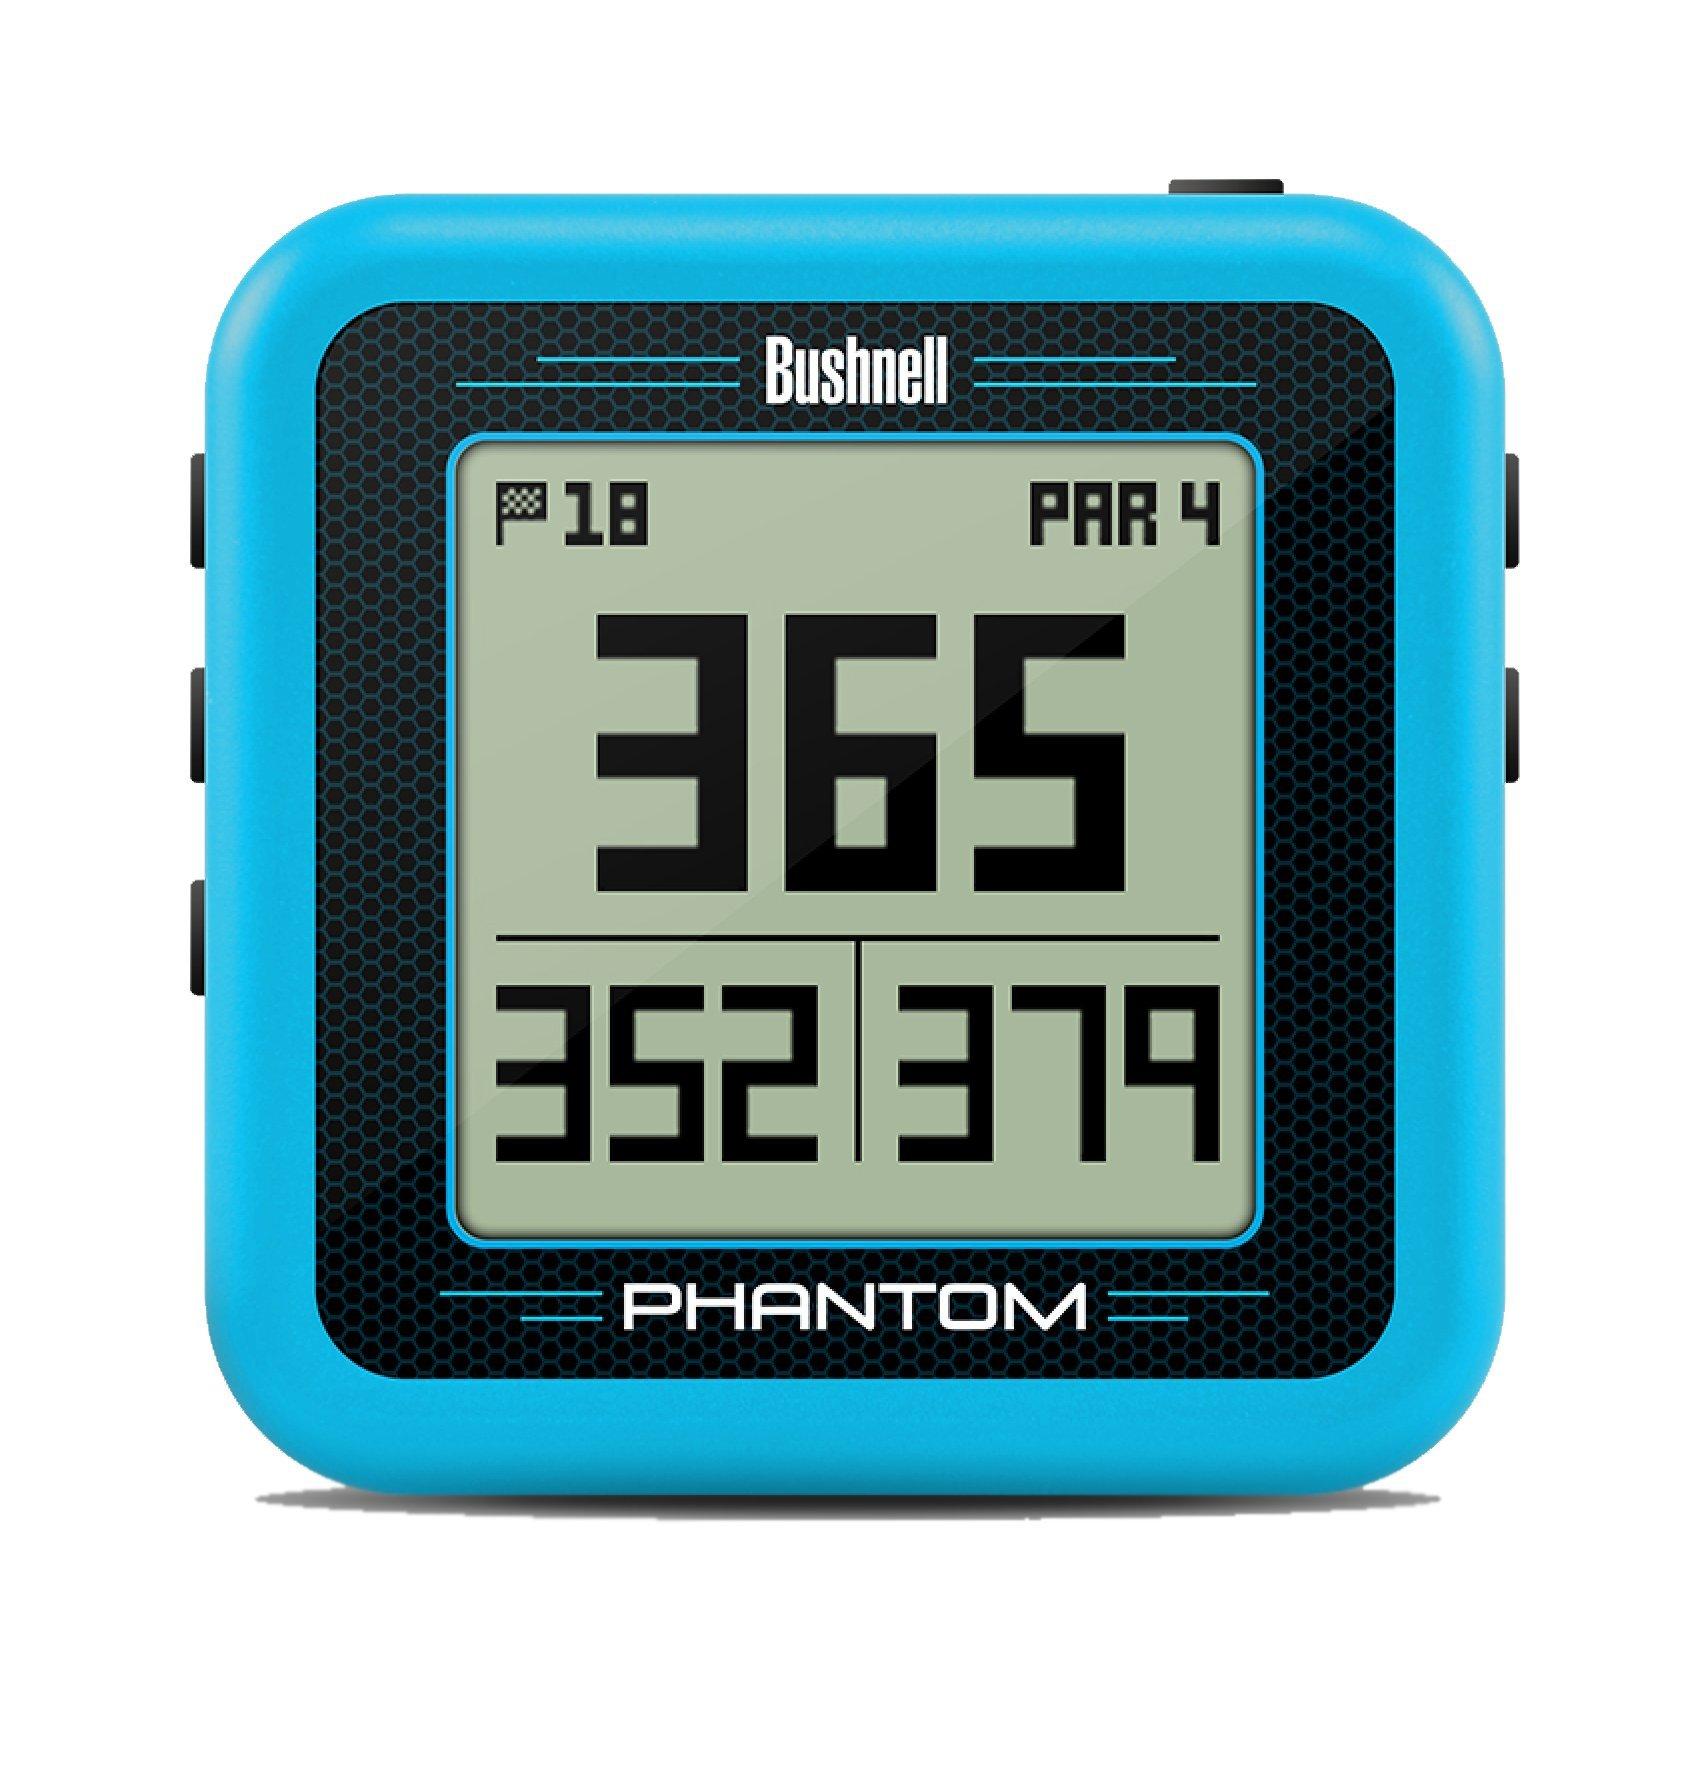 Bushnell Phantom Golf GPS, Blue/Gray by Bushnell